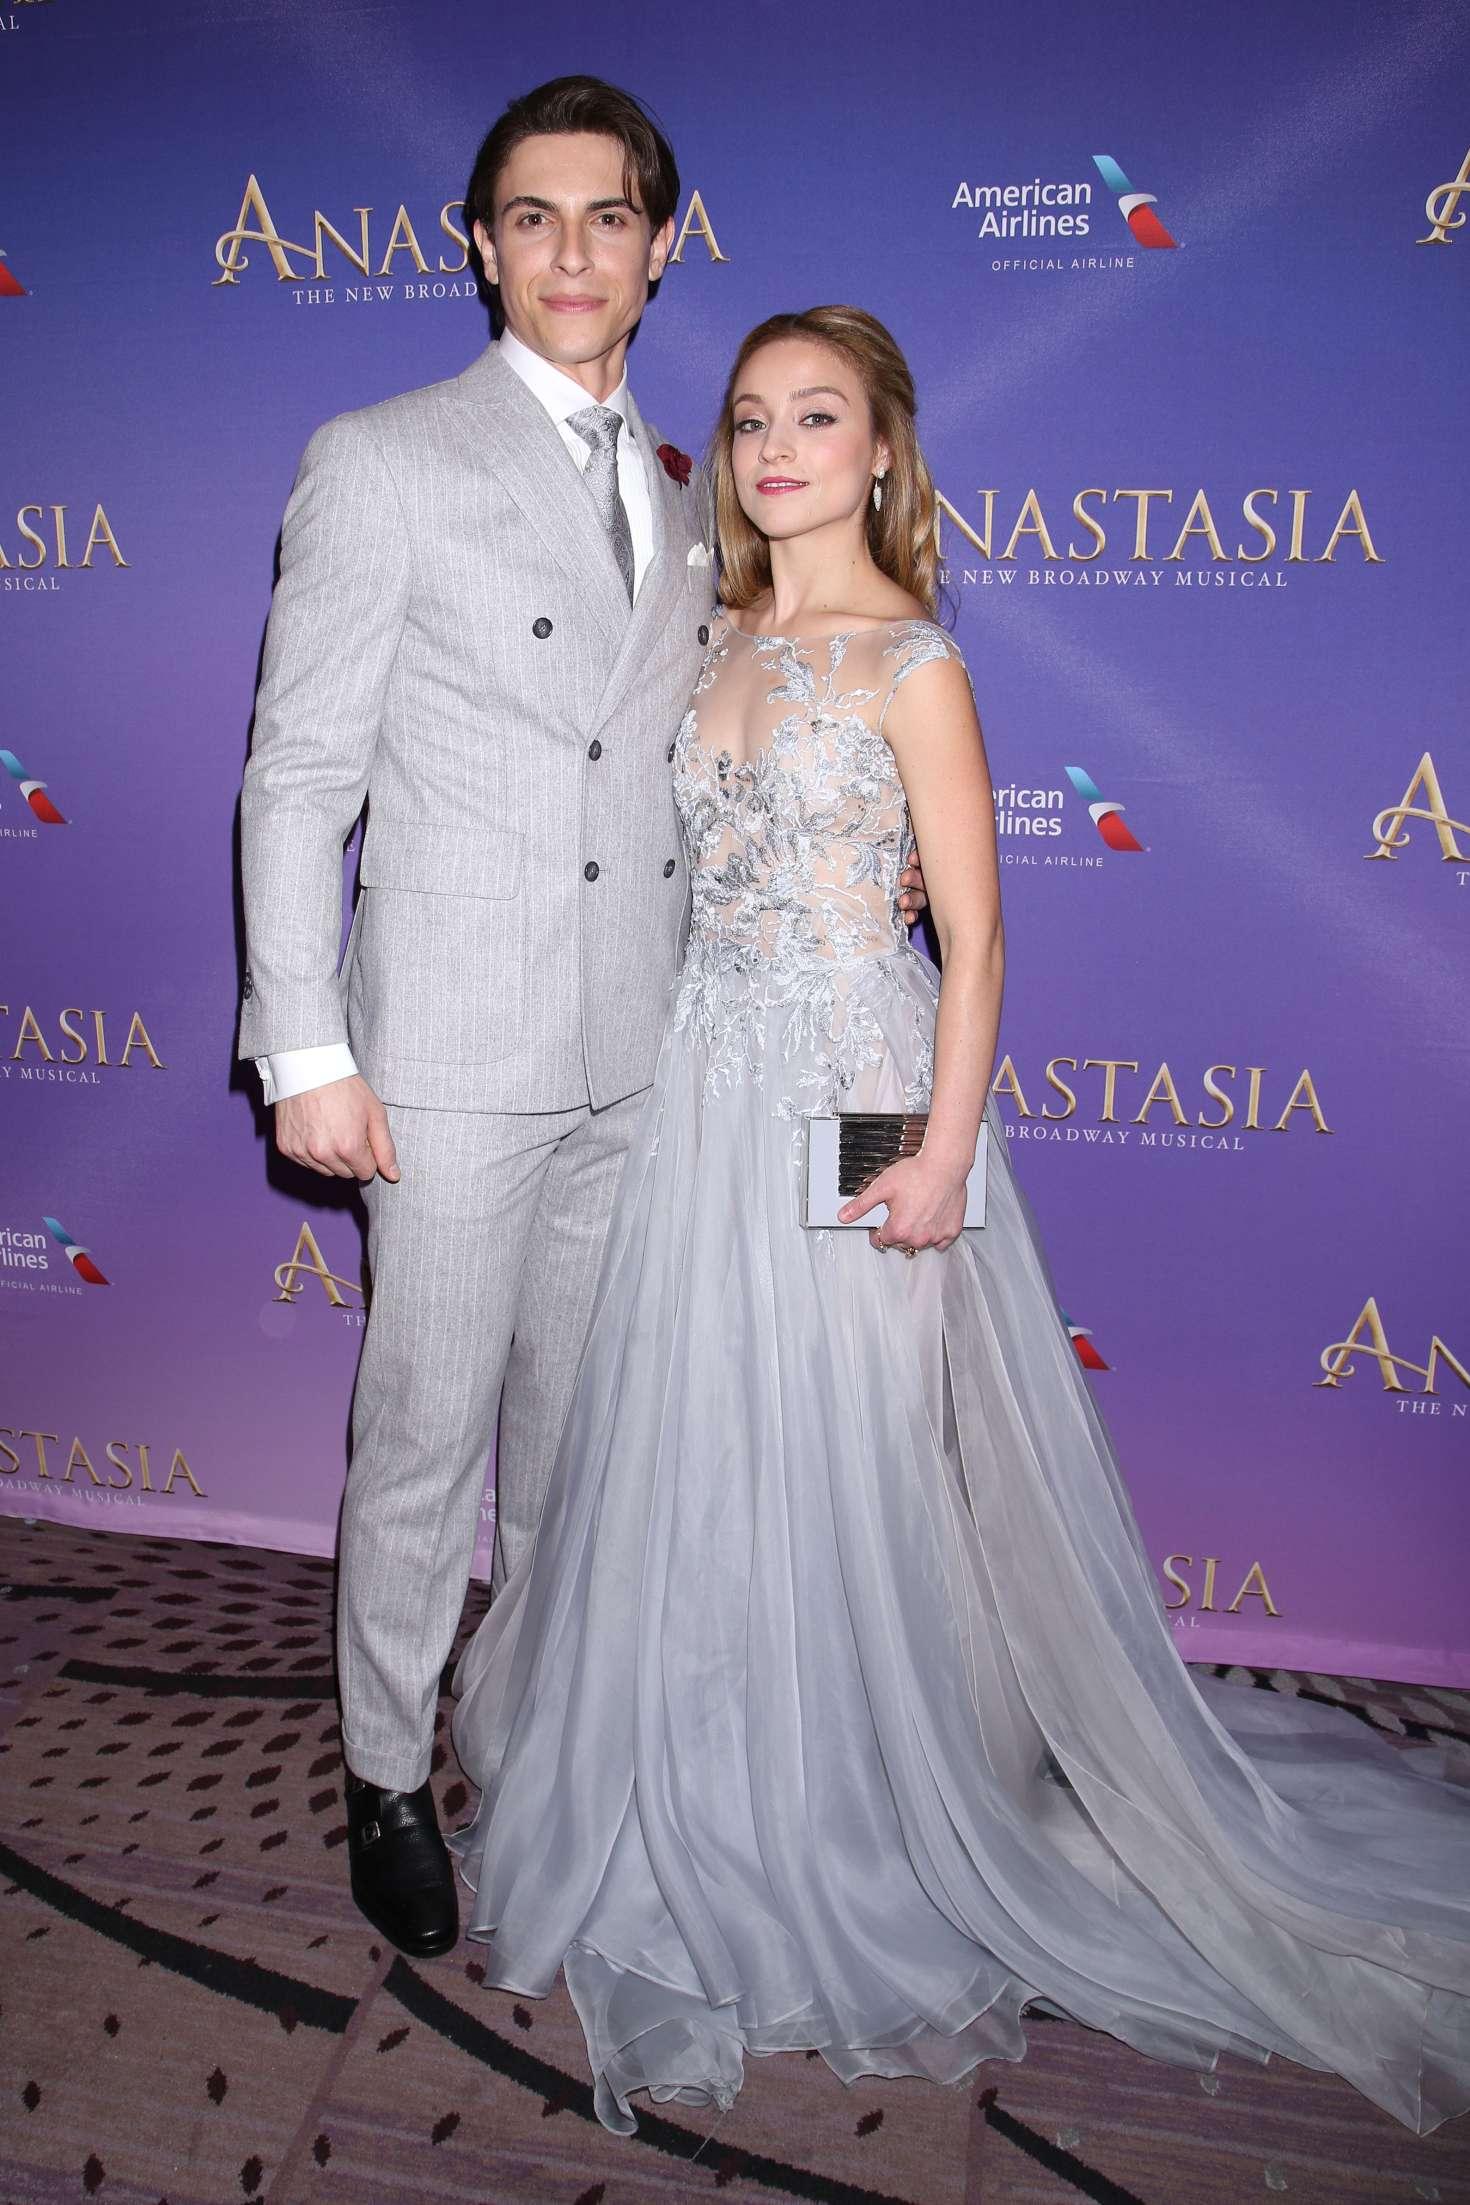 Christy Altomare - 'Anastasia' Play Opening Night in New York